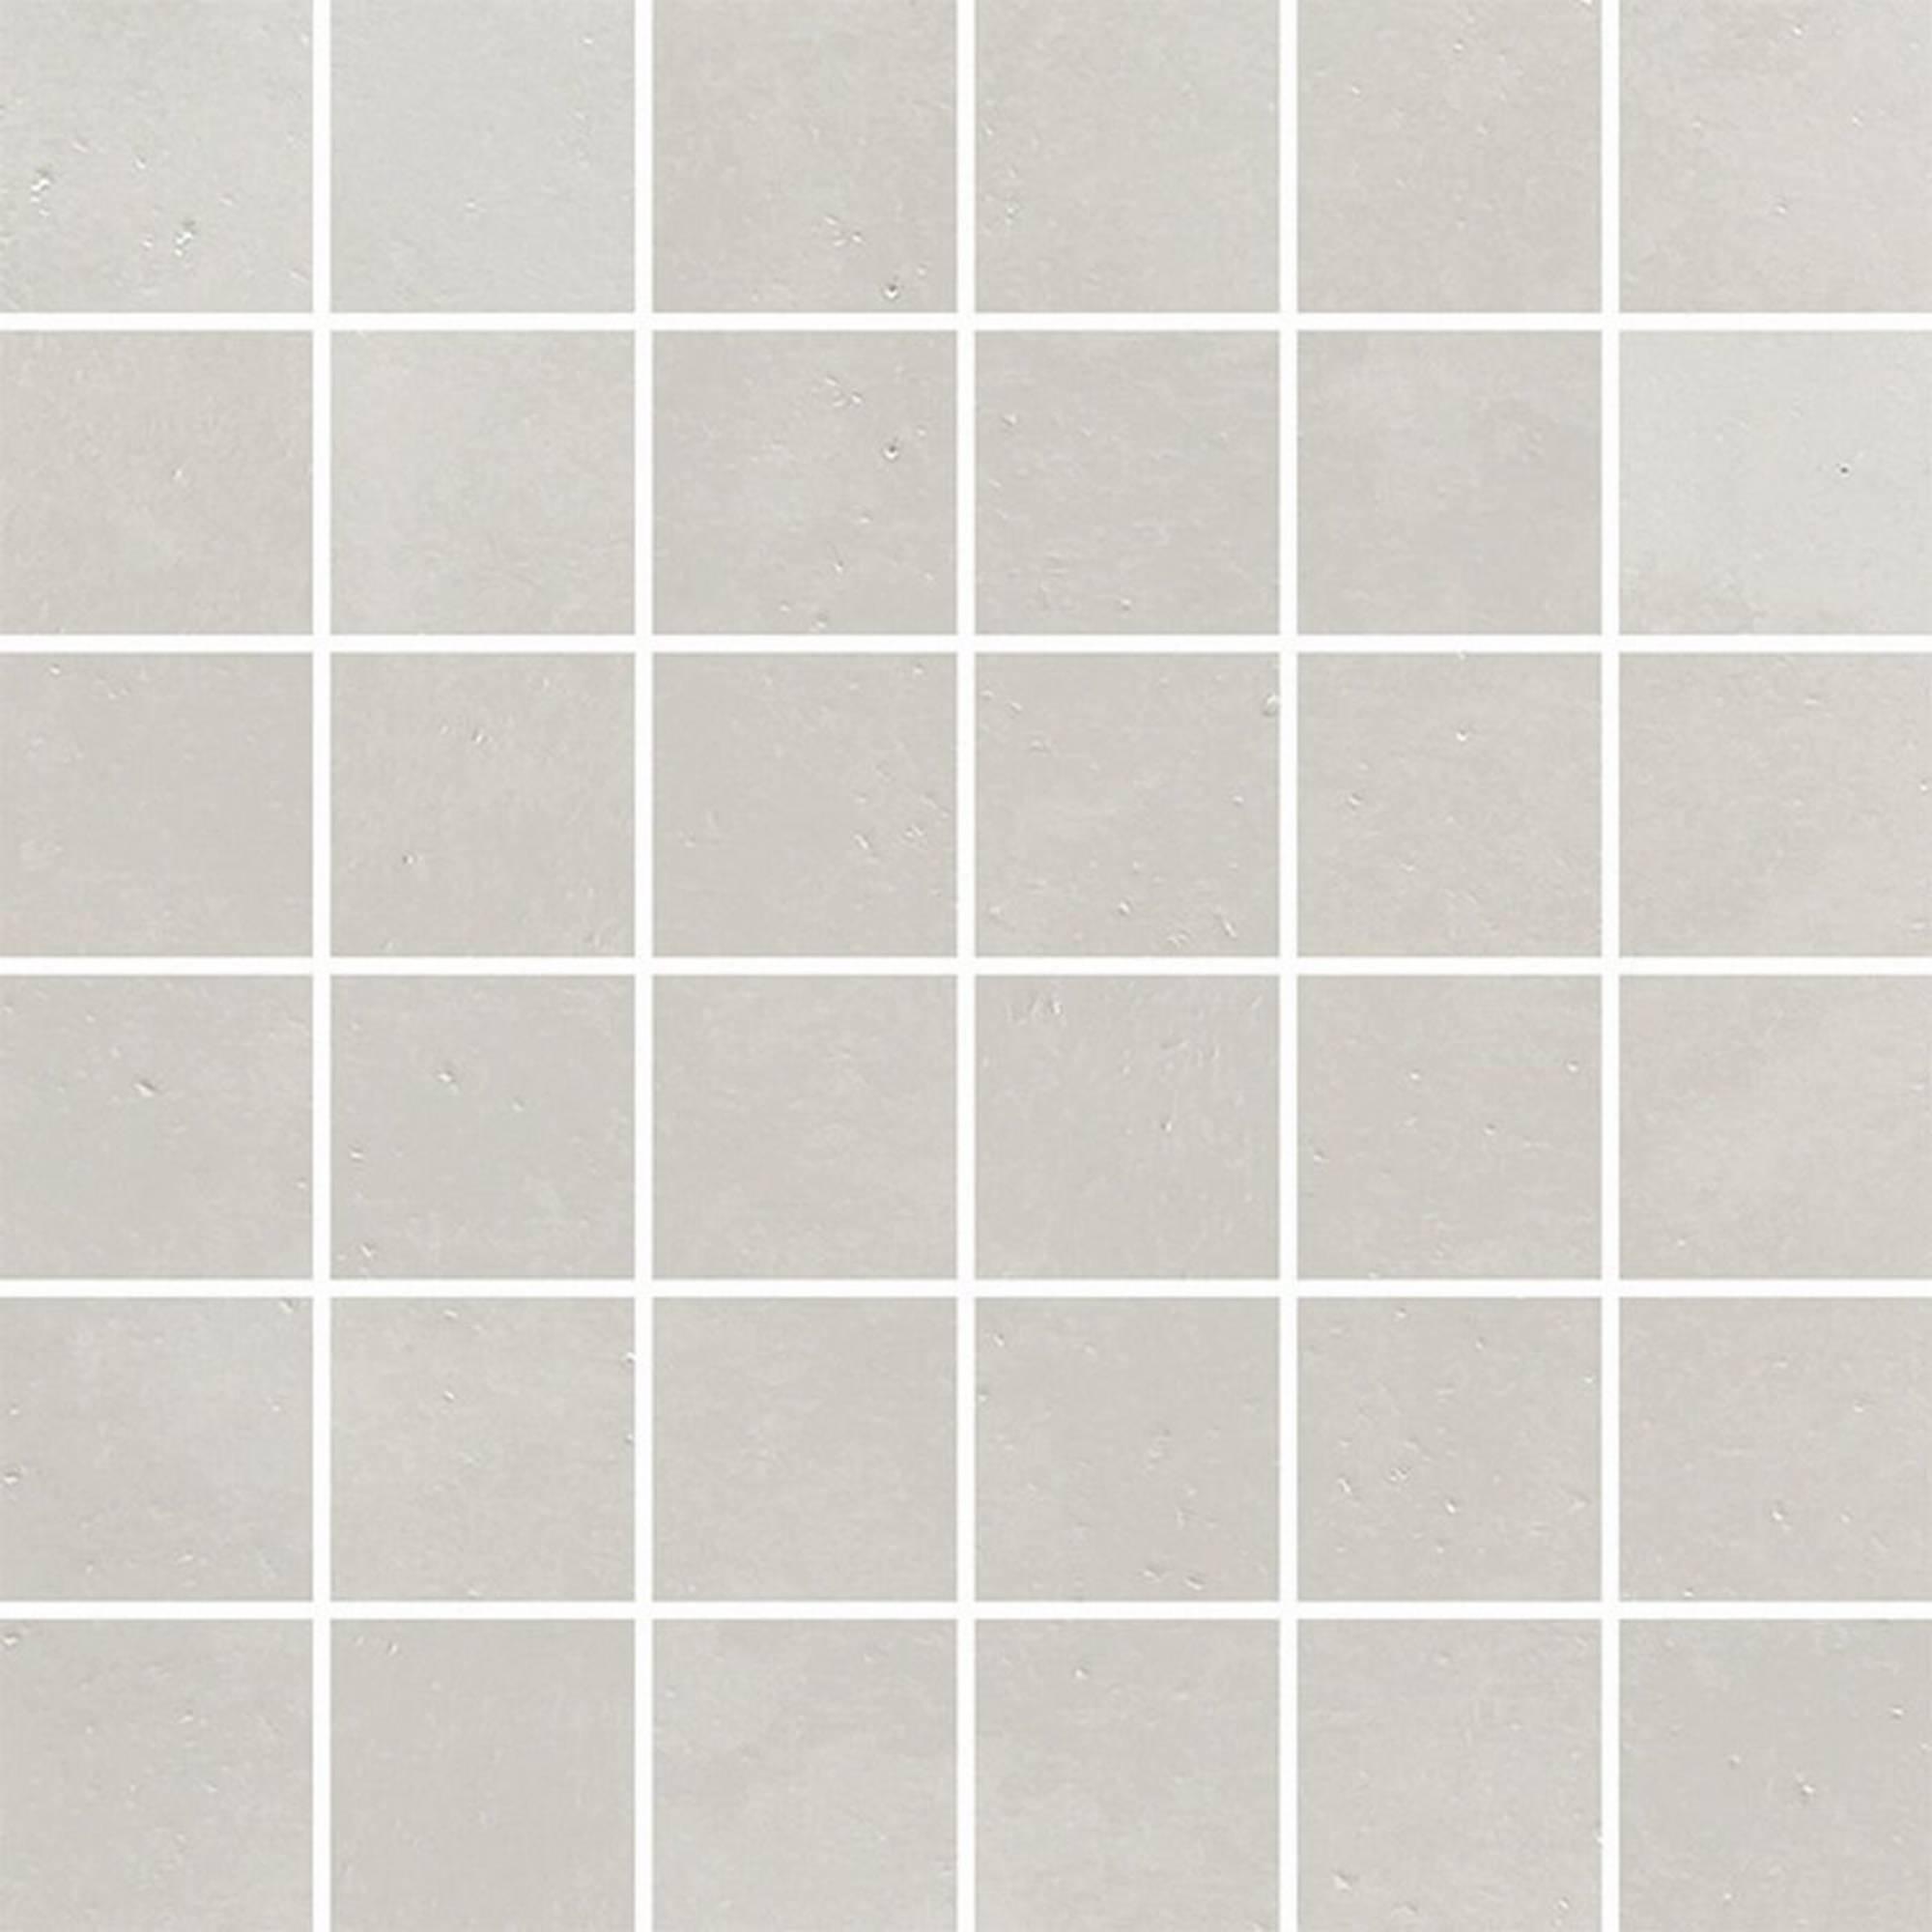 Villeroy & boch Century unlimited tegelmat 30x30 cm. blok 5 x 5 cm. a 11 stuks, licht grijs